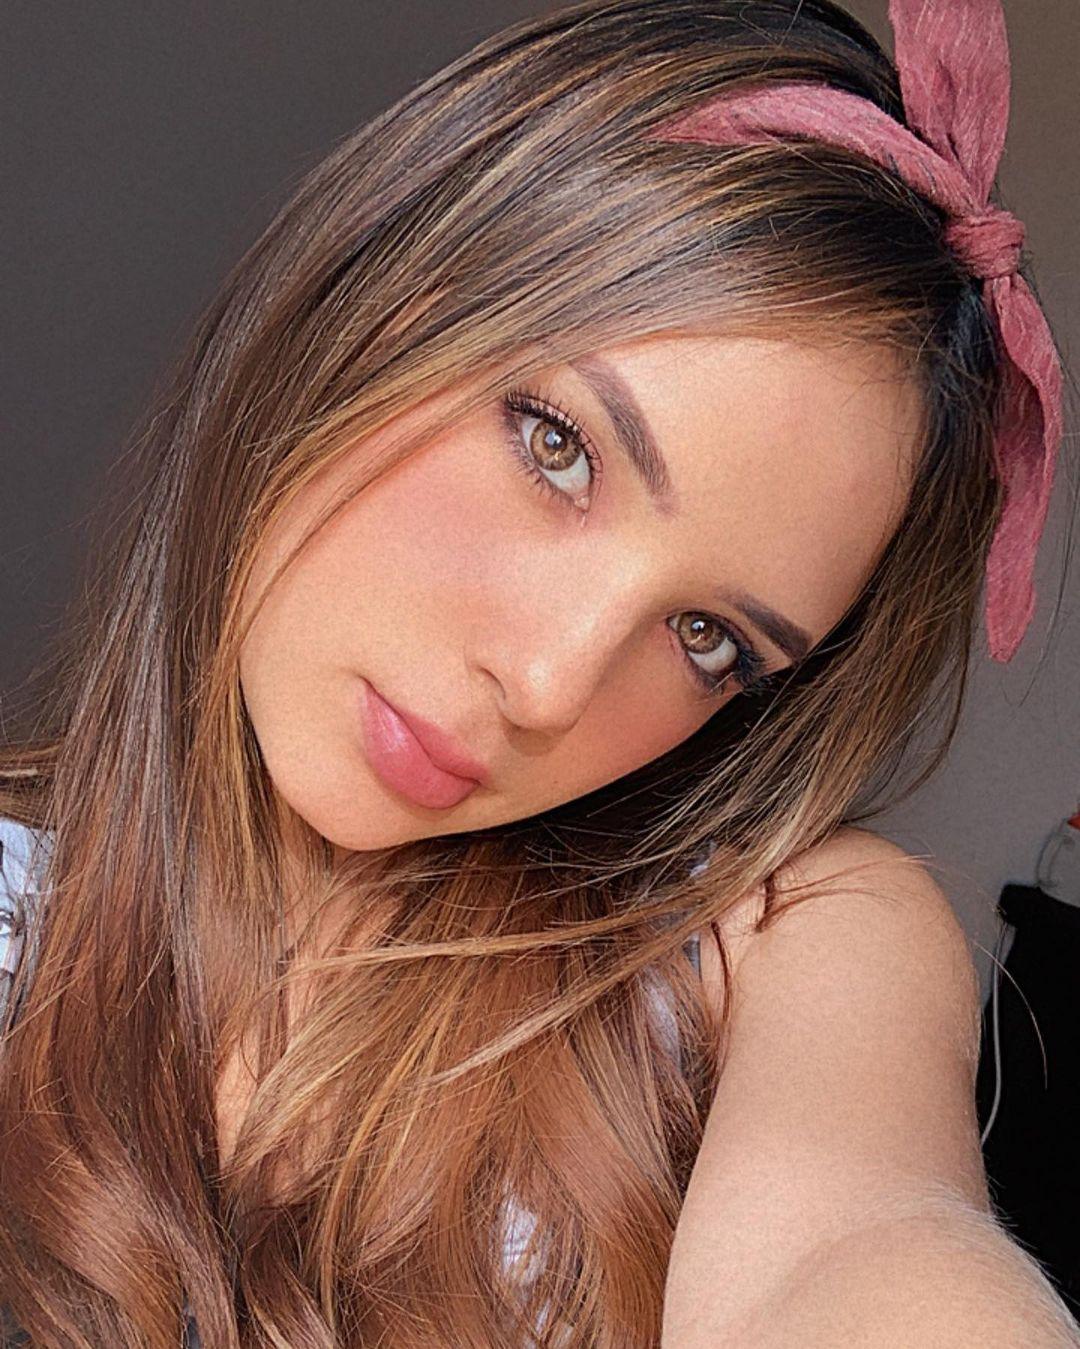 Anabel-Ramirez-Wallpapers-Insta-Fit-Bio-1